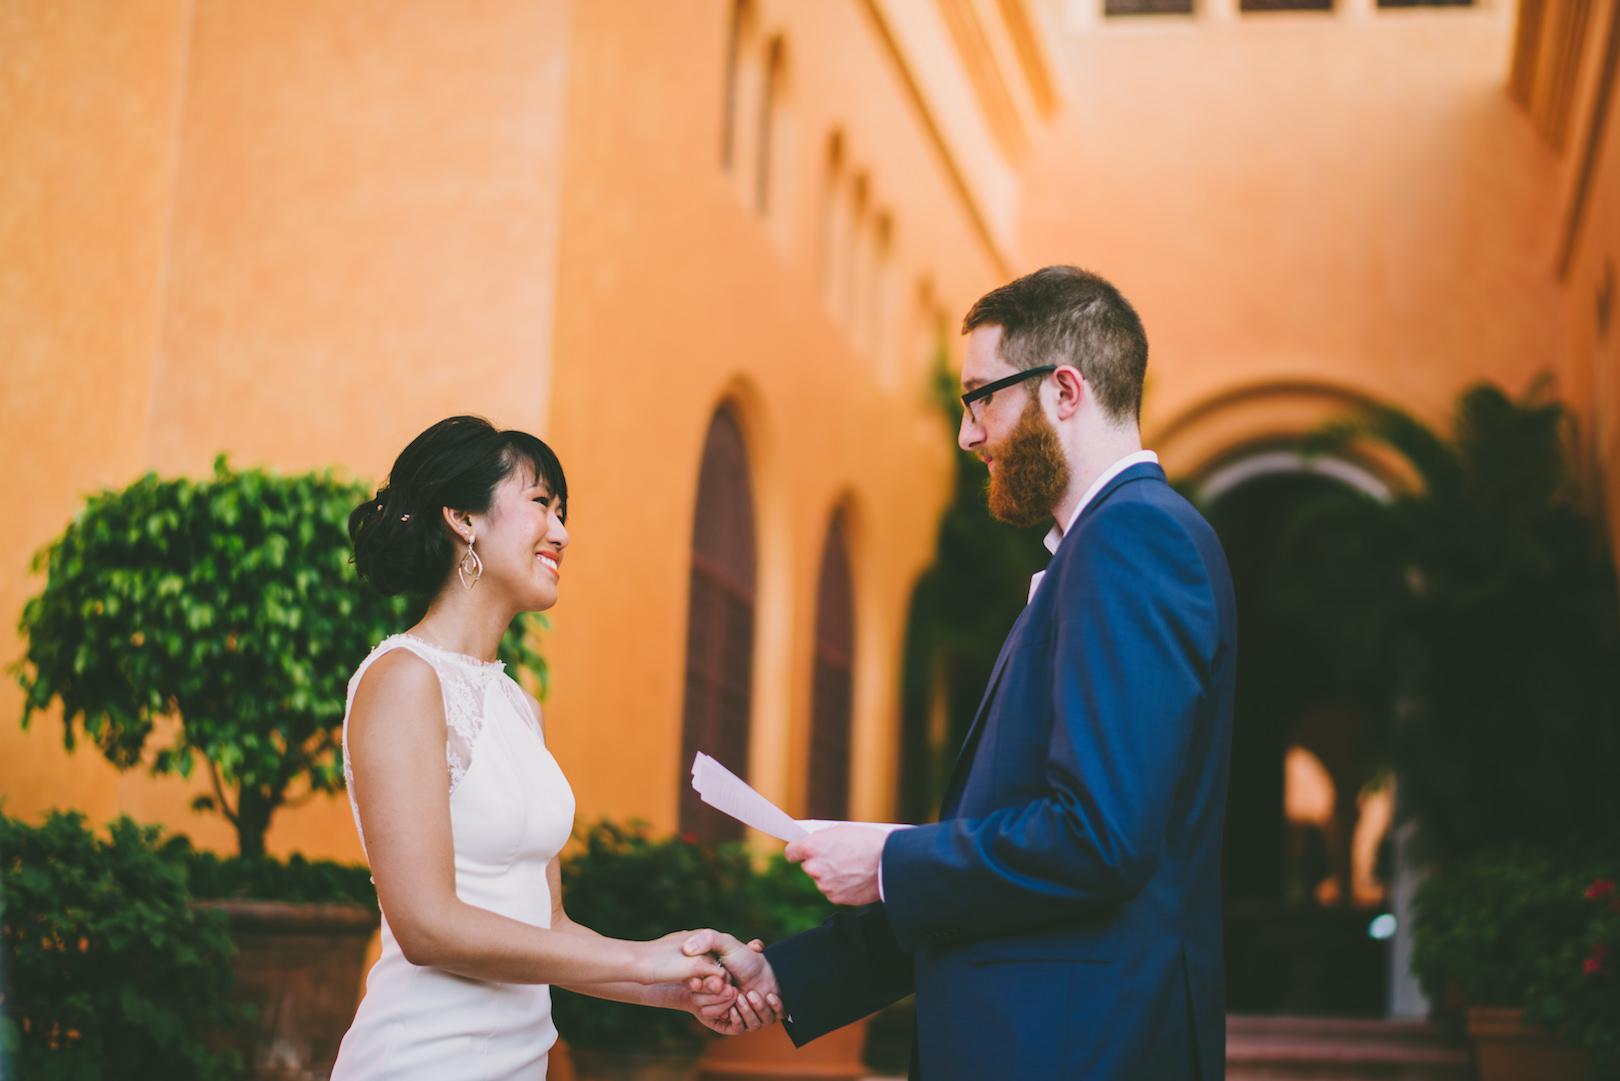 Nathan & Felicia - Wedding Day - © Dallas Kolotylo Photography - 329